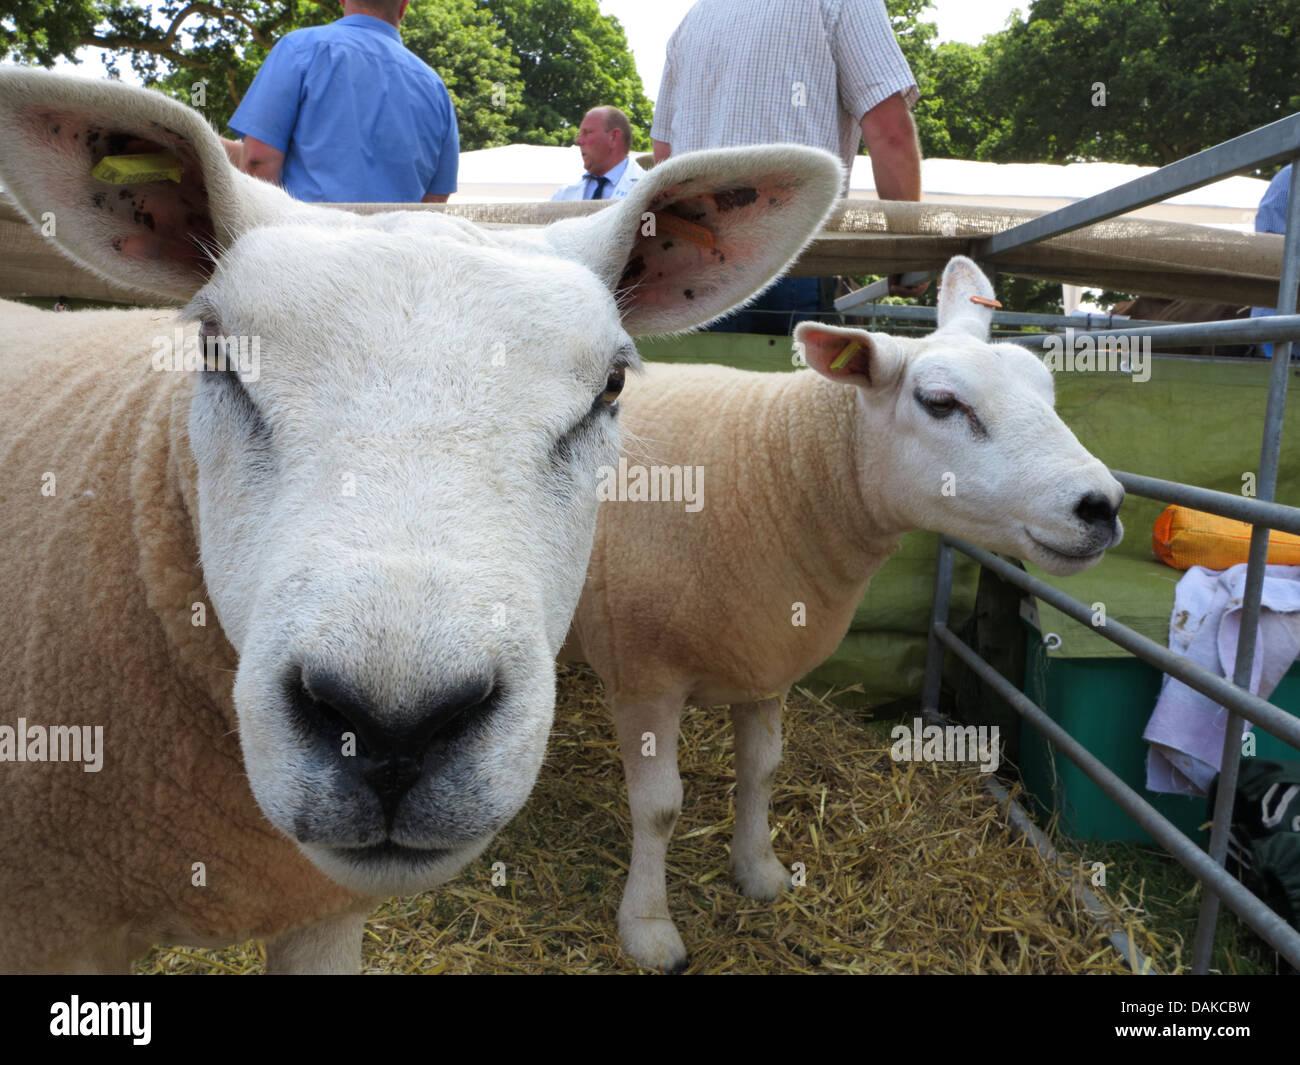 Texel sheep, Newport Show, Chetwynd Deer Park, Newport